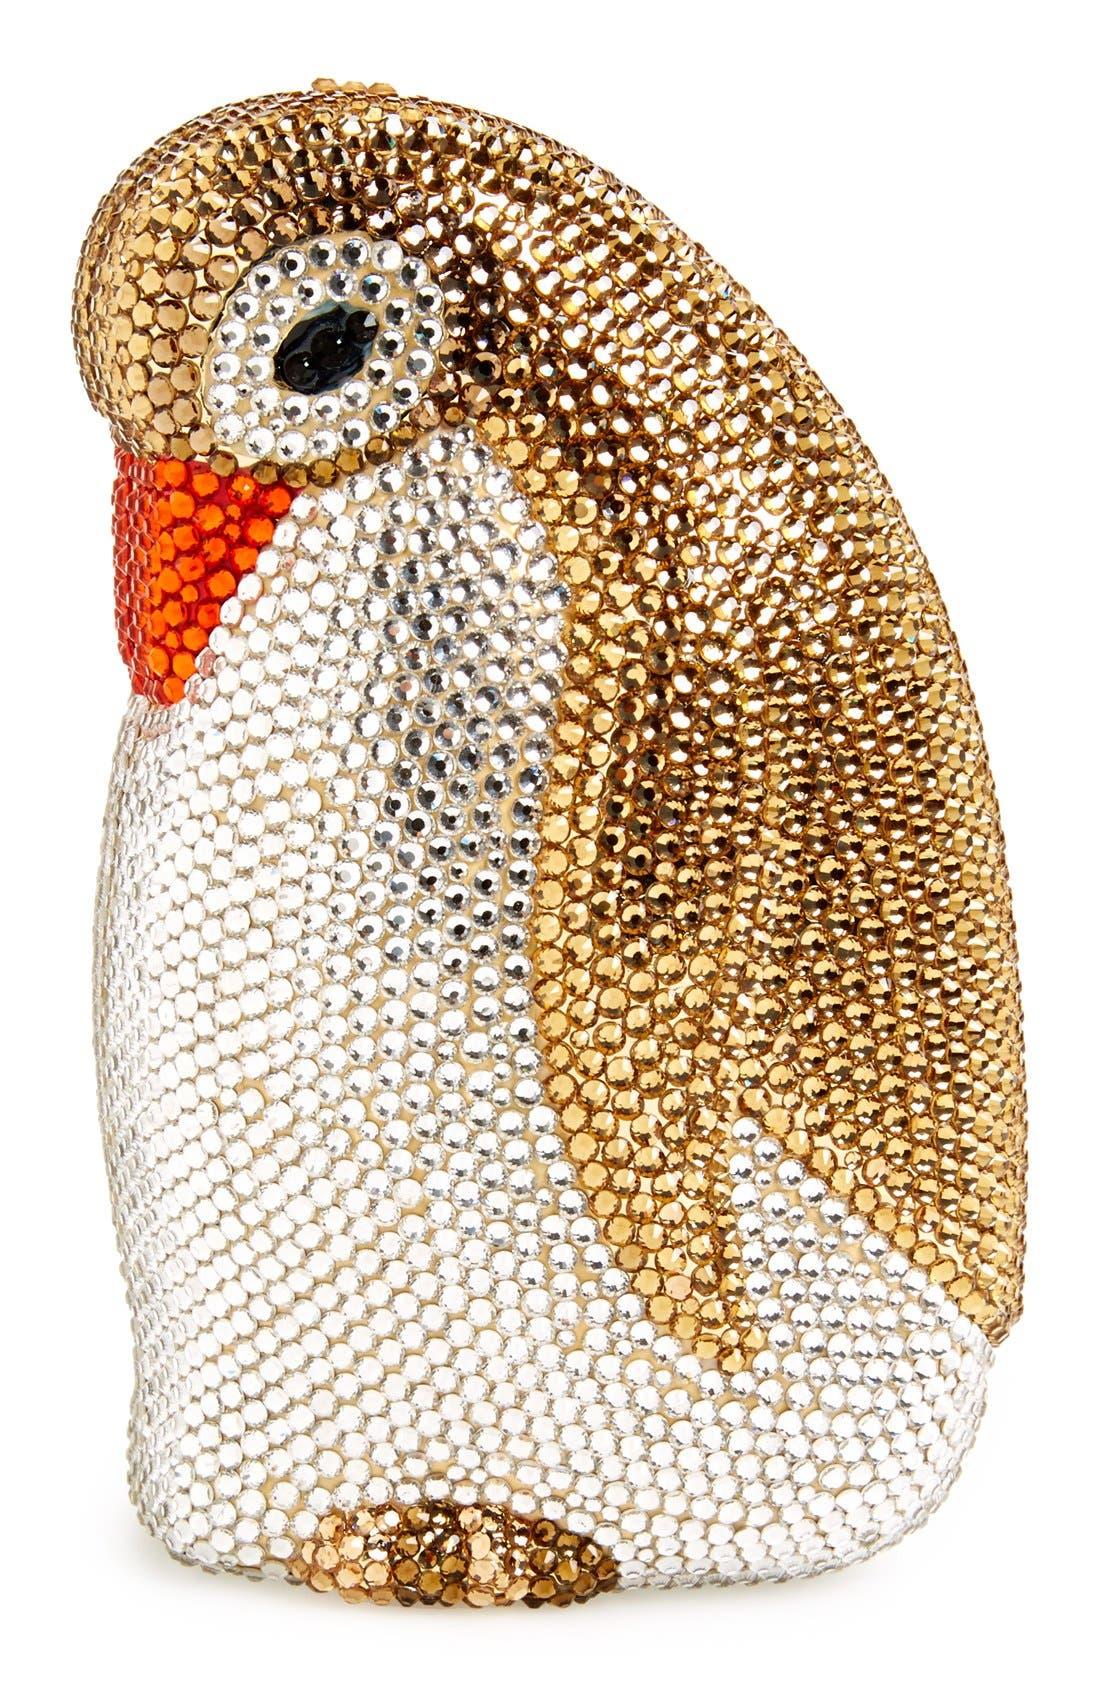 ZZDNU NATASHA COUTURE,                             Natasha Couture 'Penny The Penguin' Crystal Clutch,                             Main thumbnail 1, color,                             230